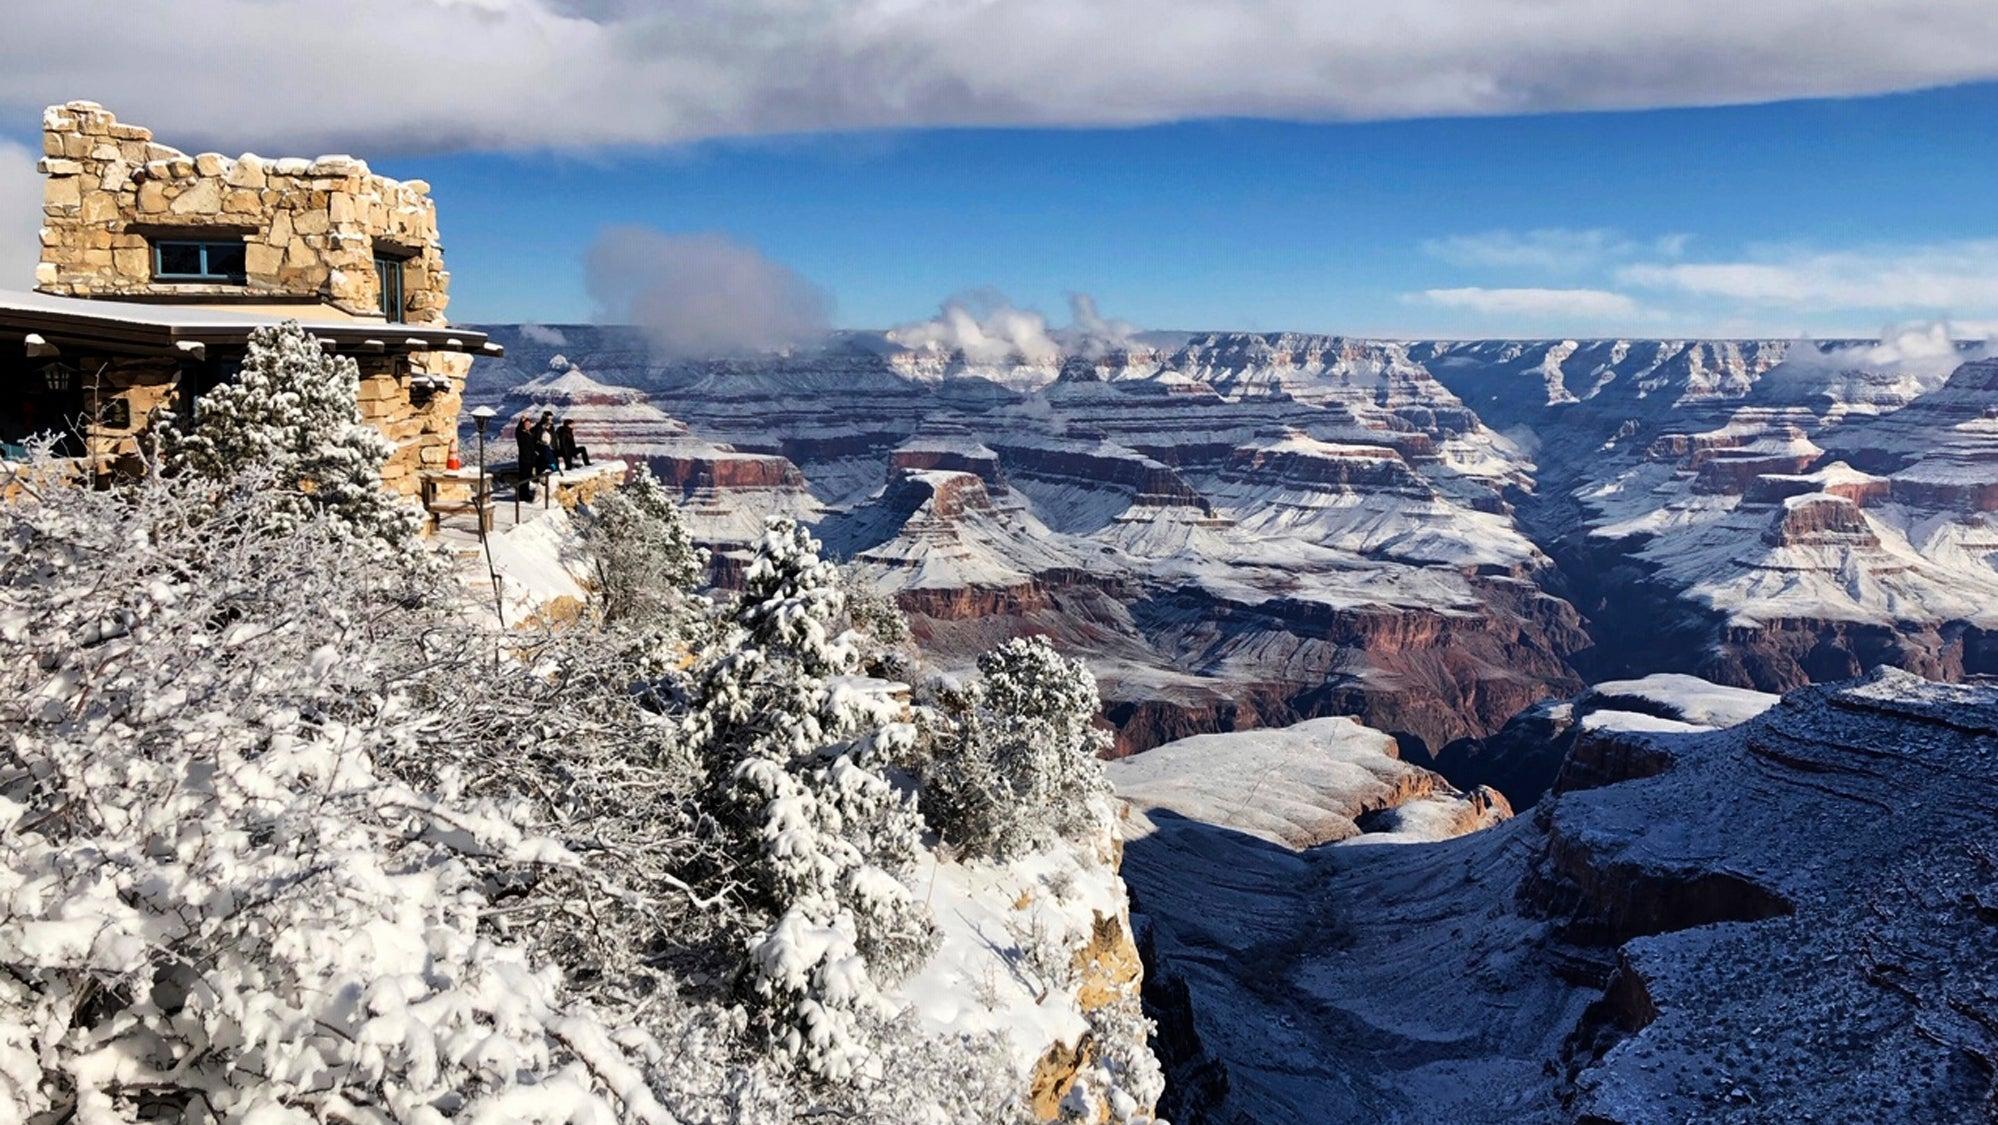 These Photos Of The Snowing Arizona Desert Look Otherworldly